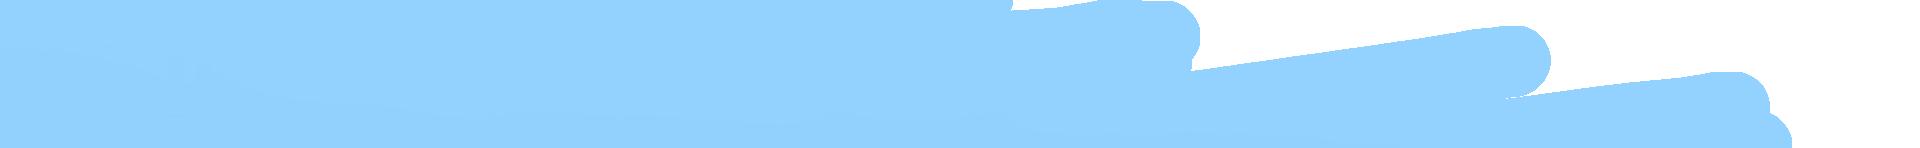 Ethikcode 3